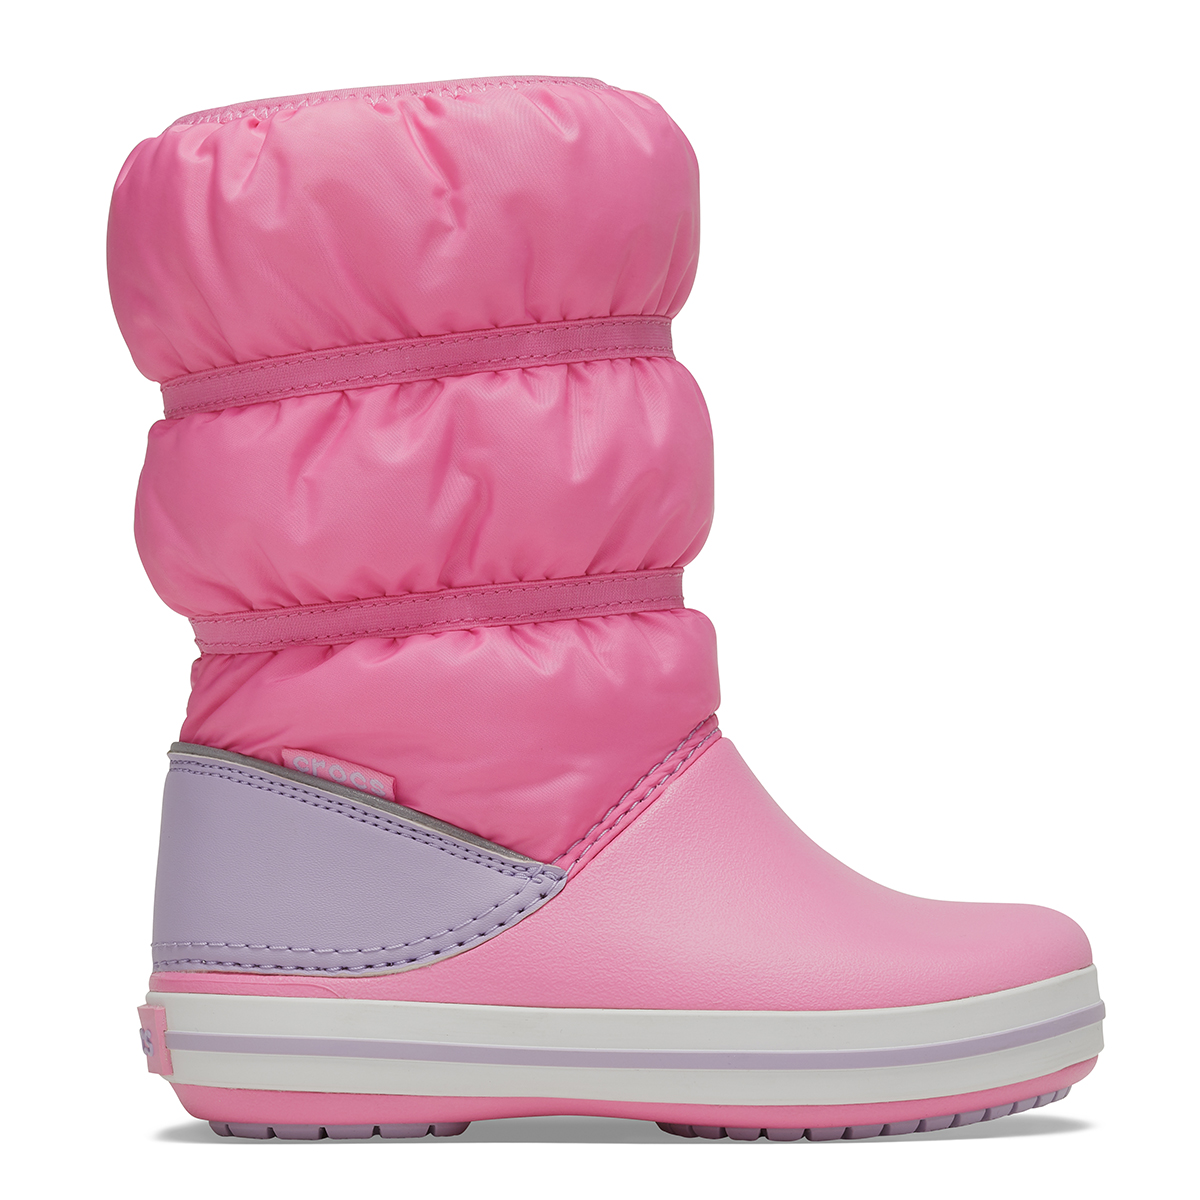 Crocband Winter Boot K - Pembe Limonata/Lavanta